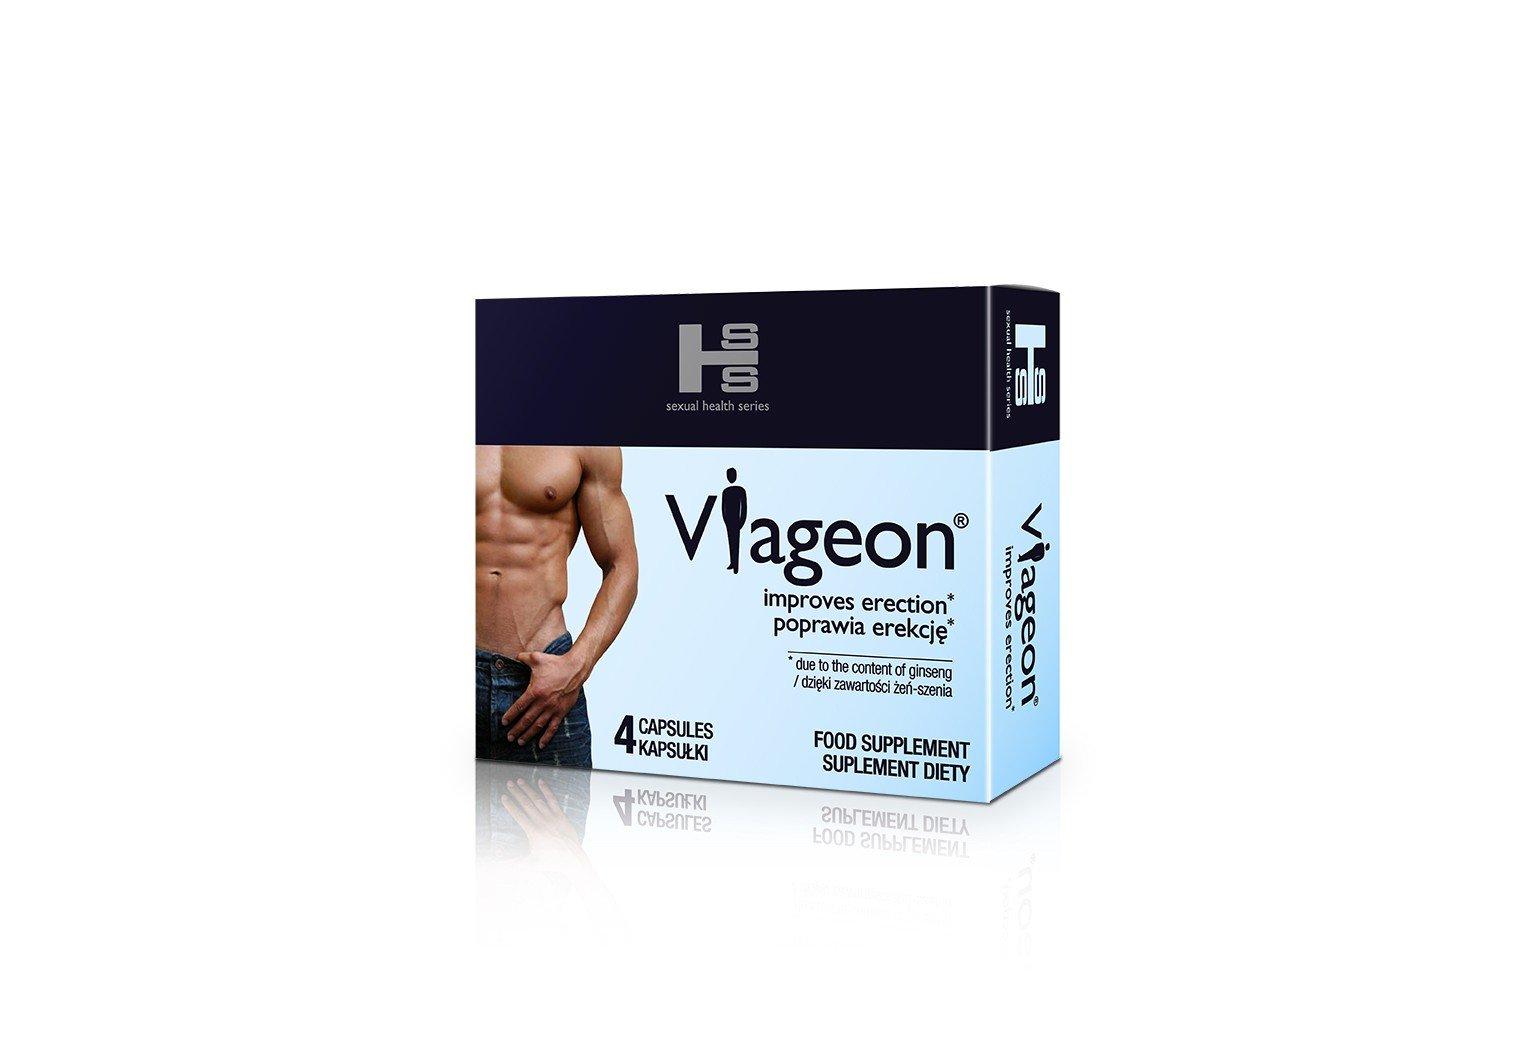 Viageon 4 kapsułki - na problemy z potencją